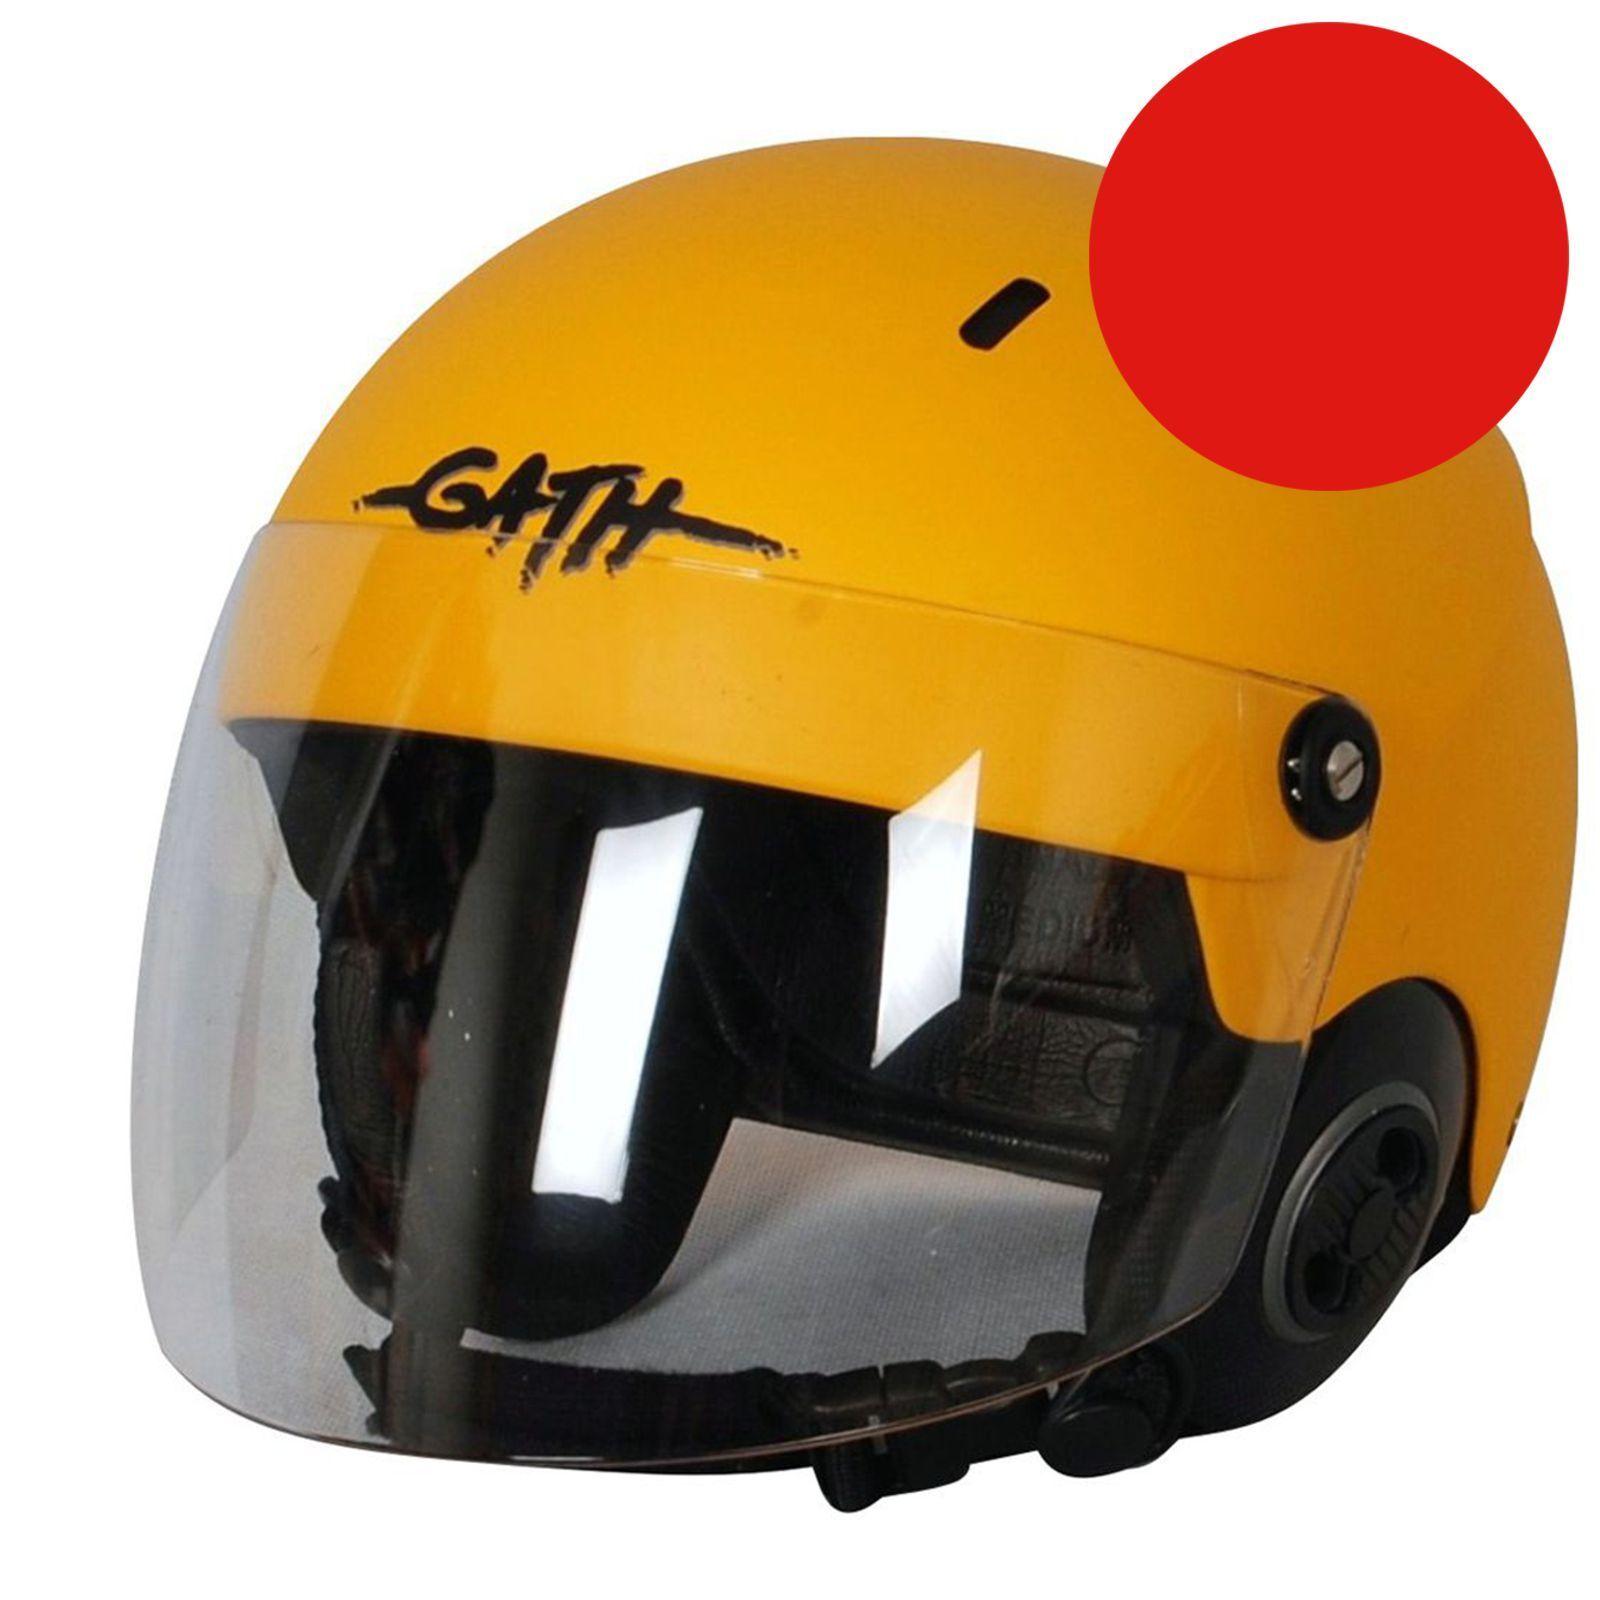 GATH Helm RESCUE Safety rot matt Gr XL  rot   Windsurf  Kite  Wakeboard Kanu